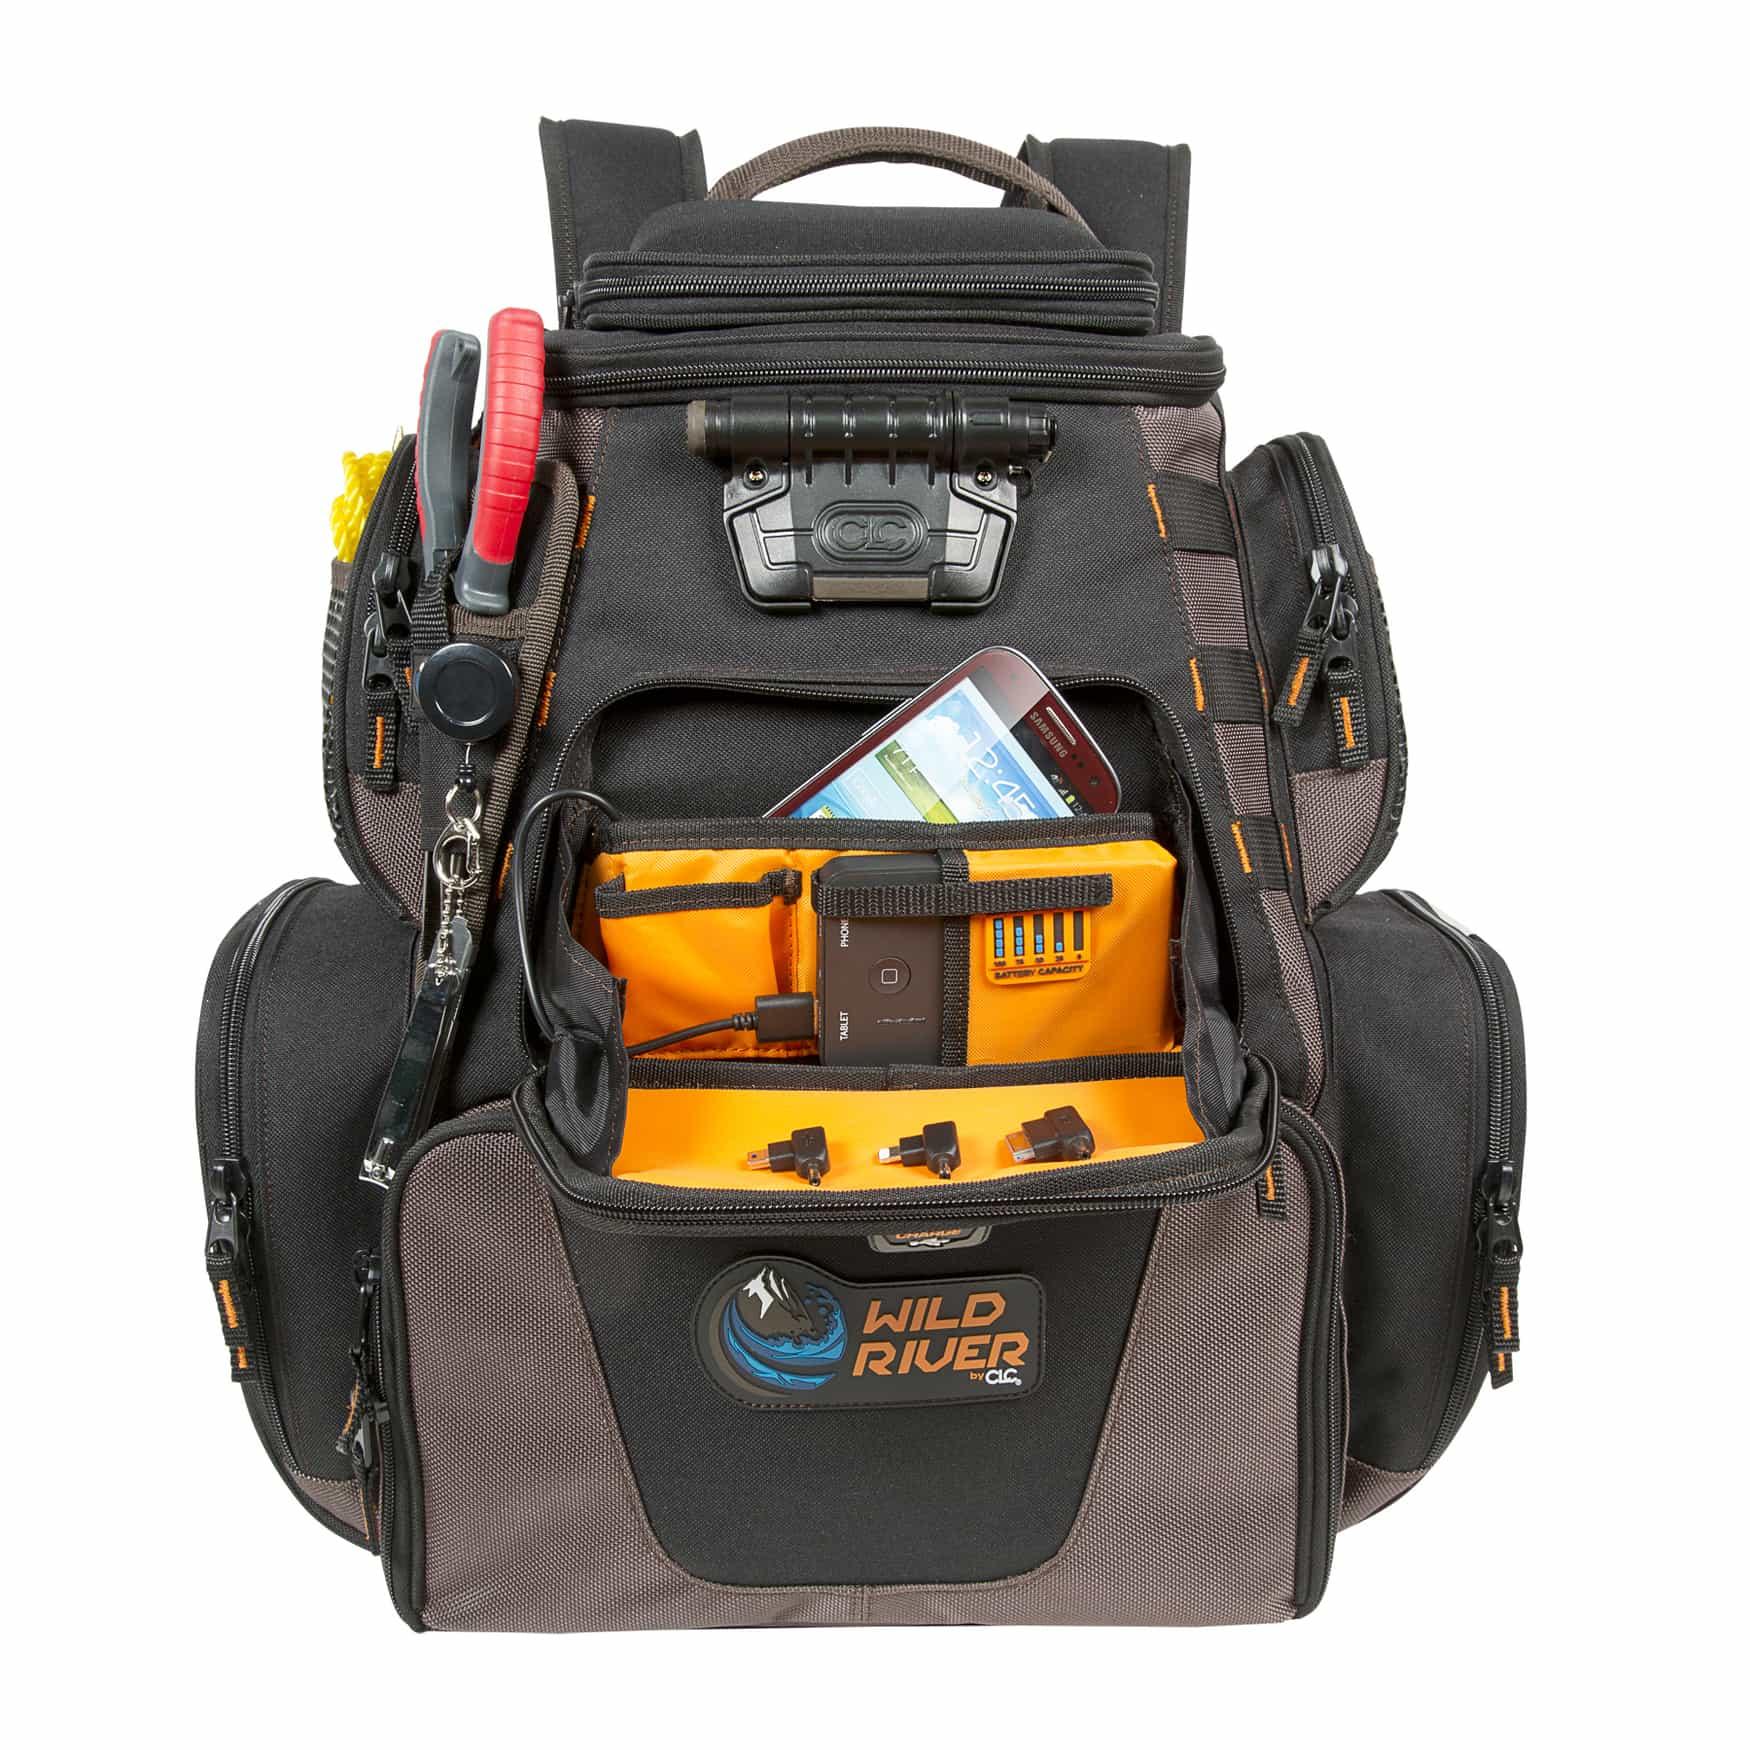 Wild river backpacks offer power supply led lighting for Fishing tackle backpack